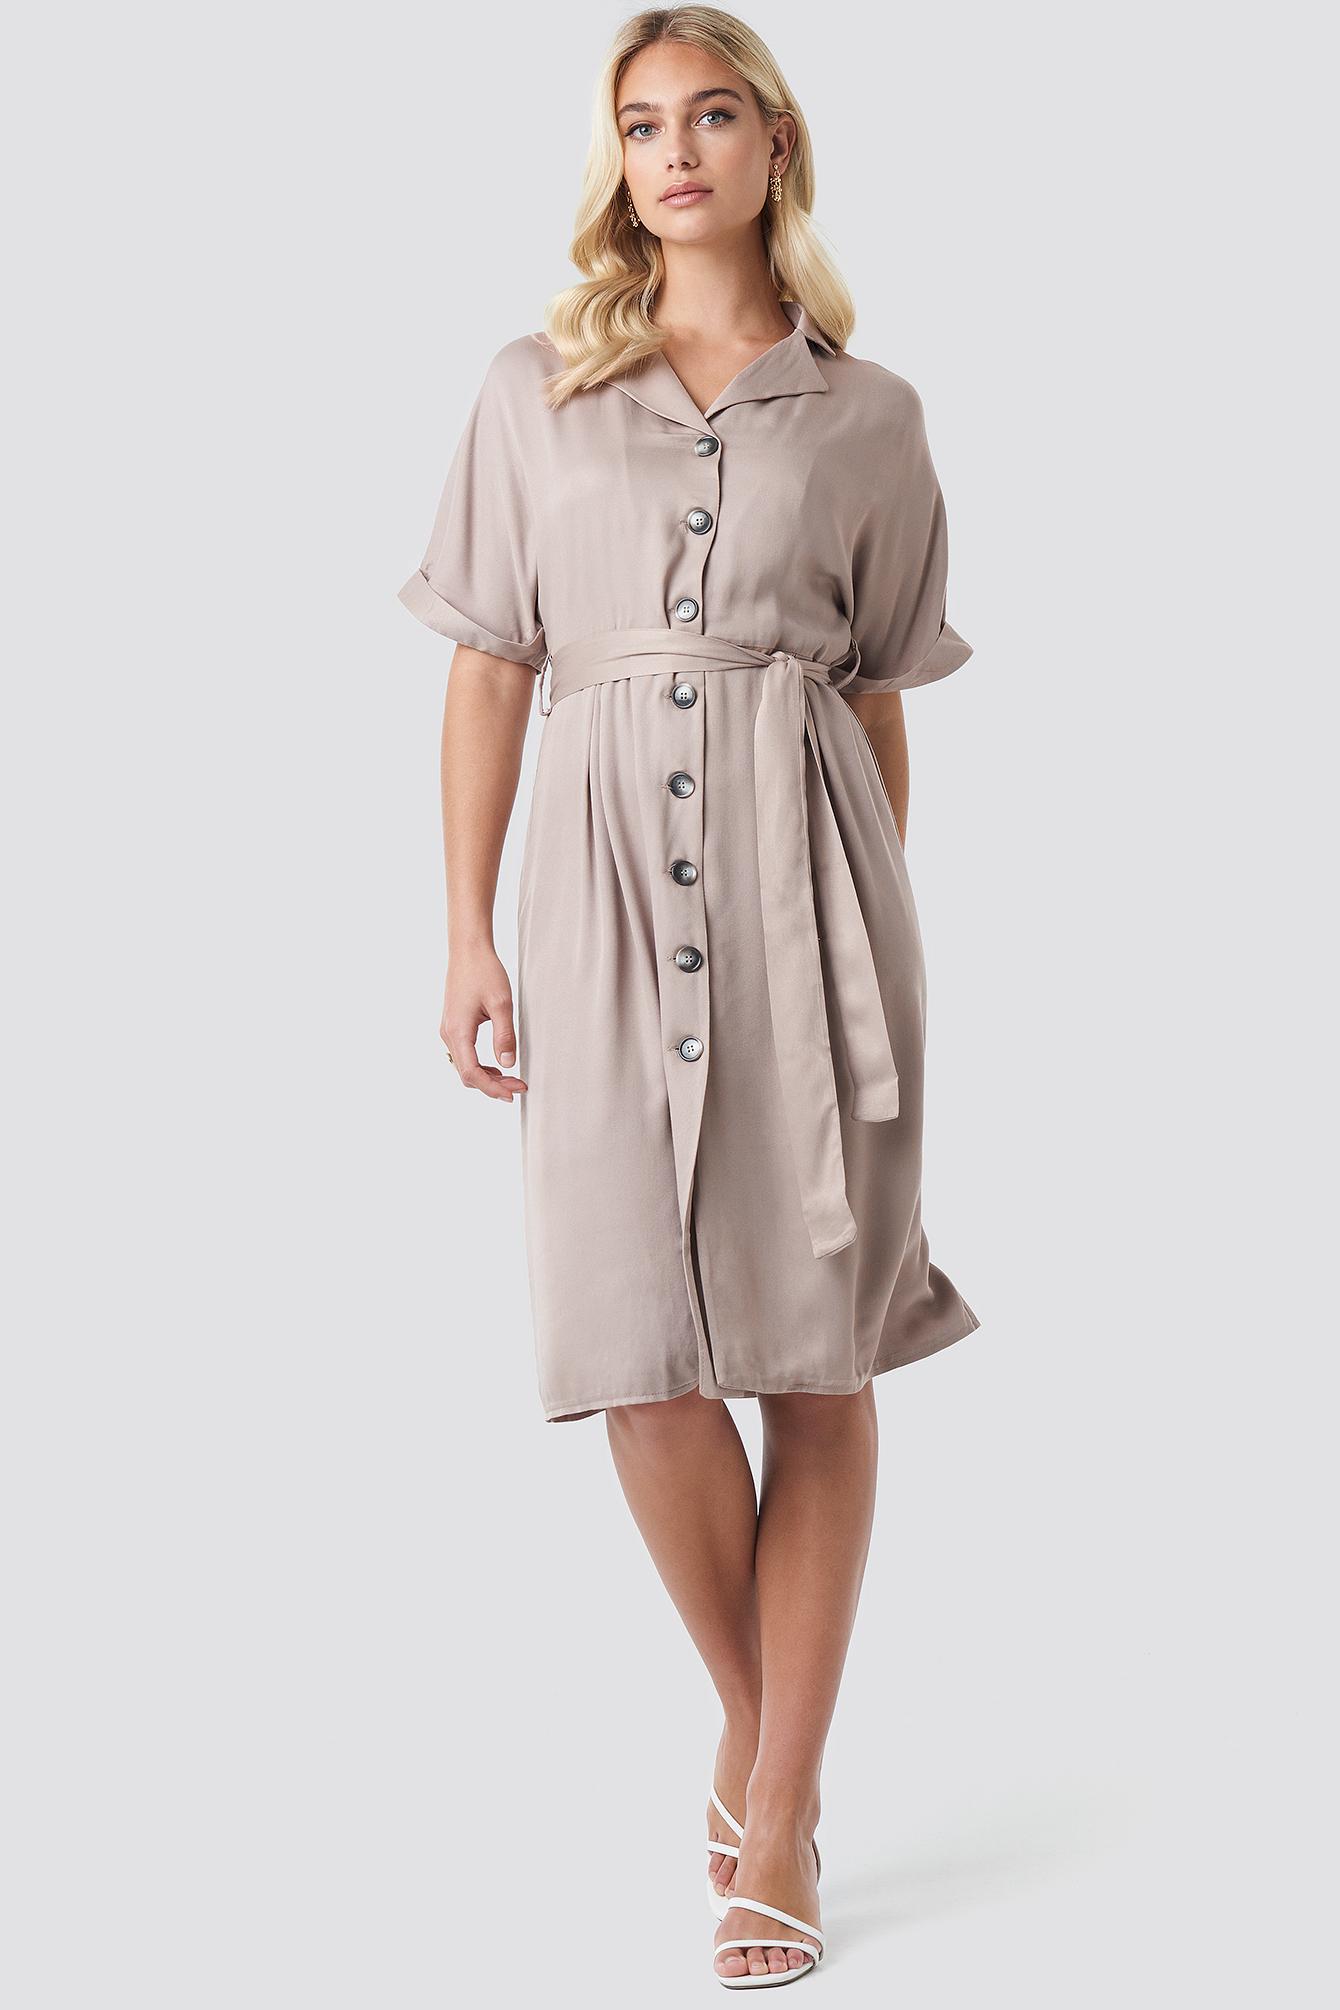 Tulum Binding Detail Dress NA-KD.COM